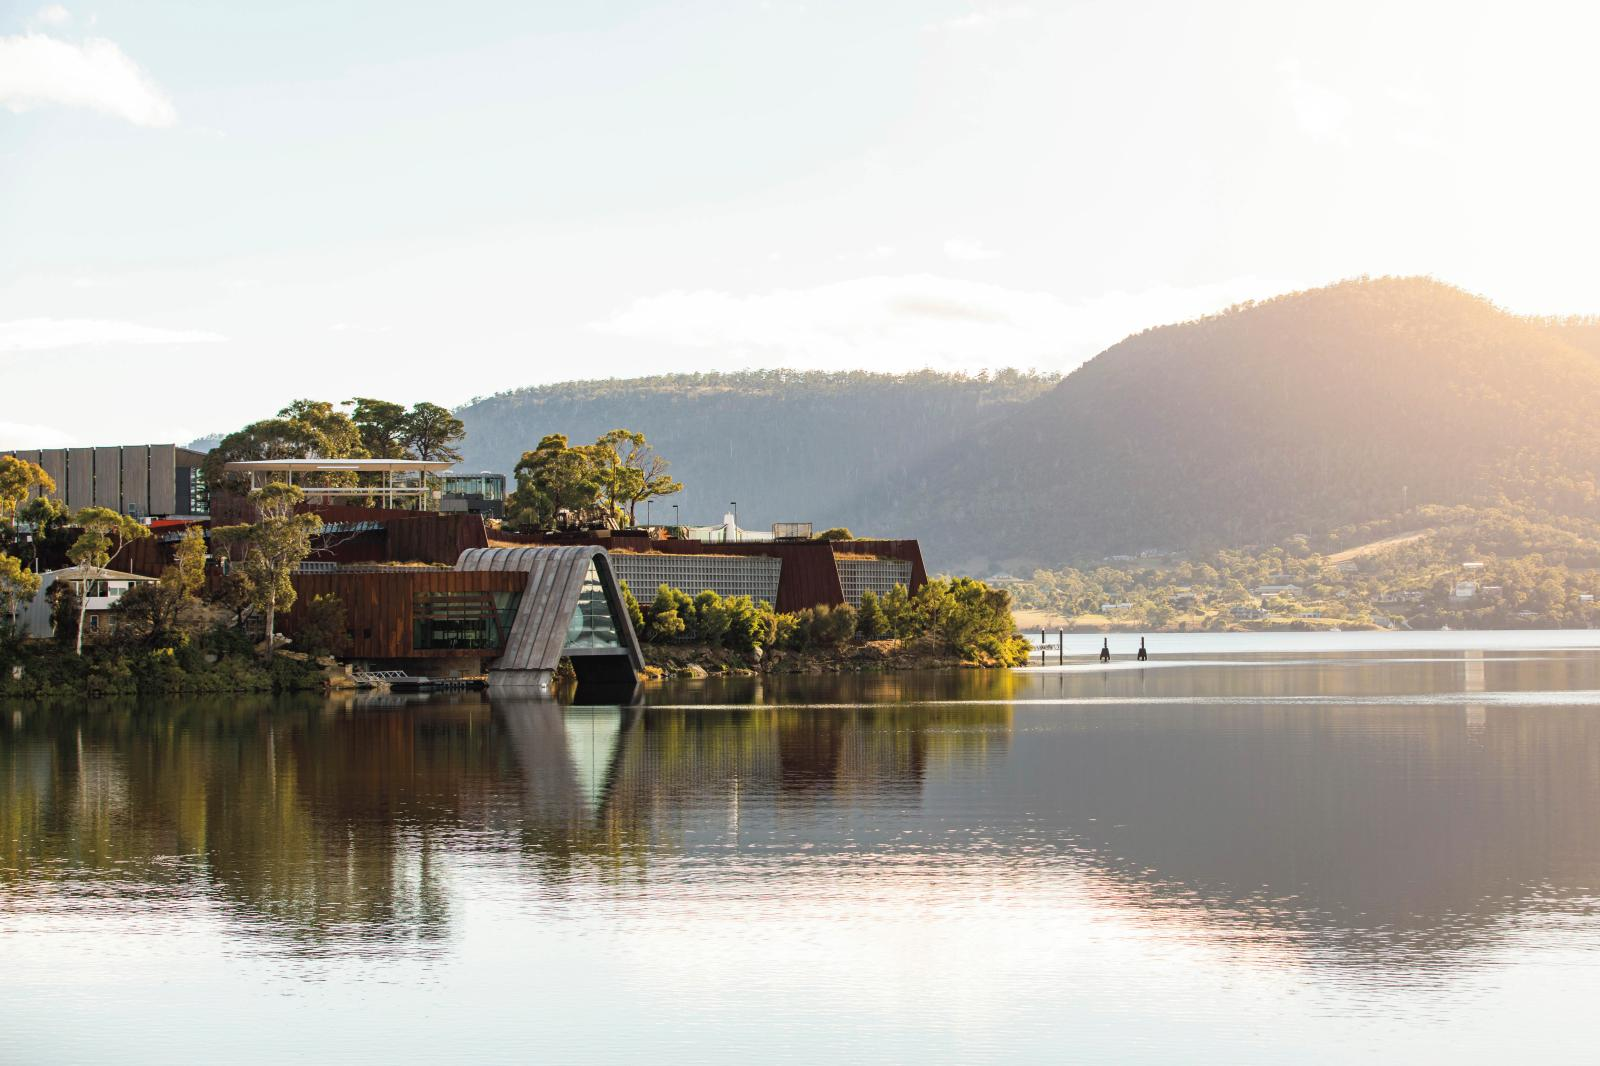 Le Mona depuis le fleuve Derwent. © Mona/Jesse Hunniford Image courtesy of the artists and Mona, Hobart, Tasmania, Australia